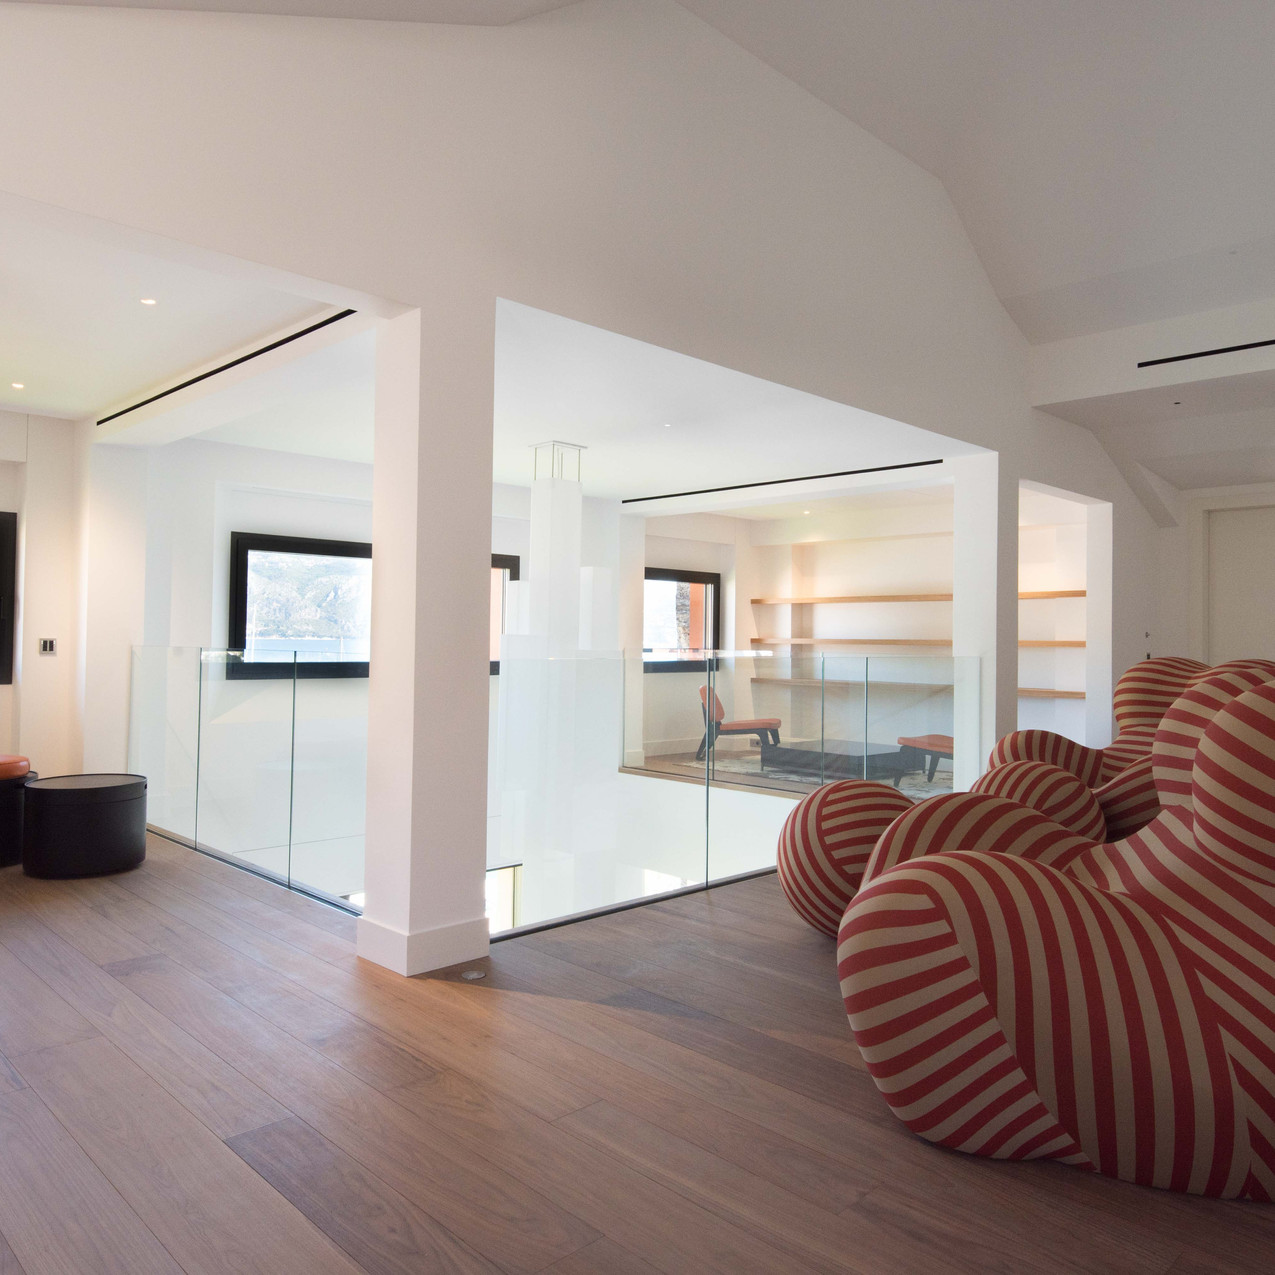 photographe architecture nice france french riviera paca cote dazur interieur-42